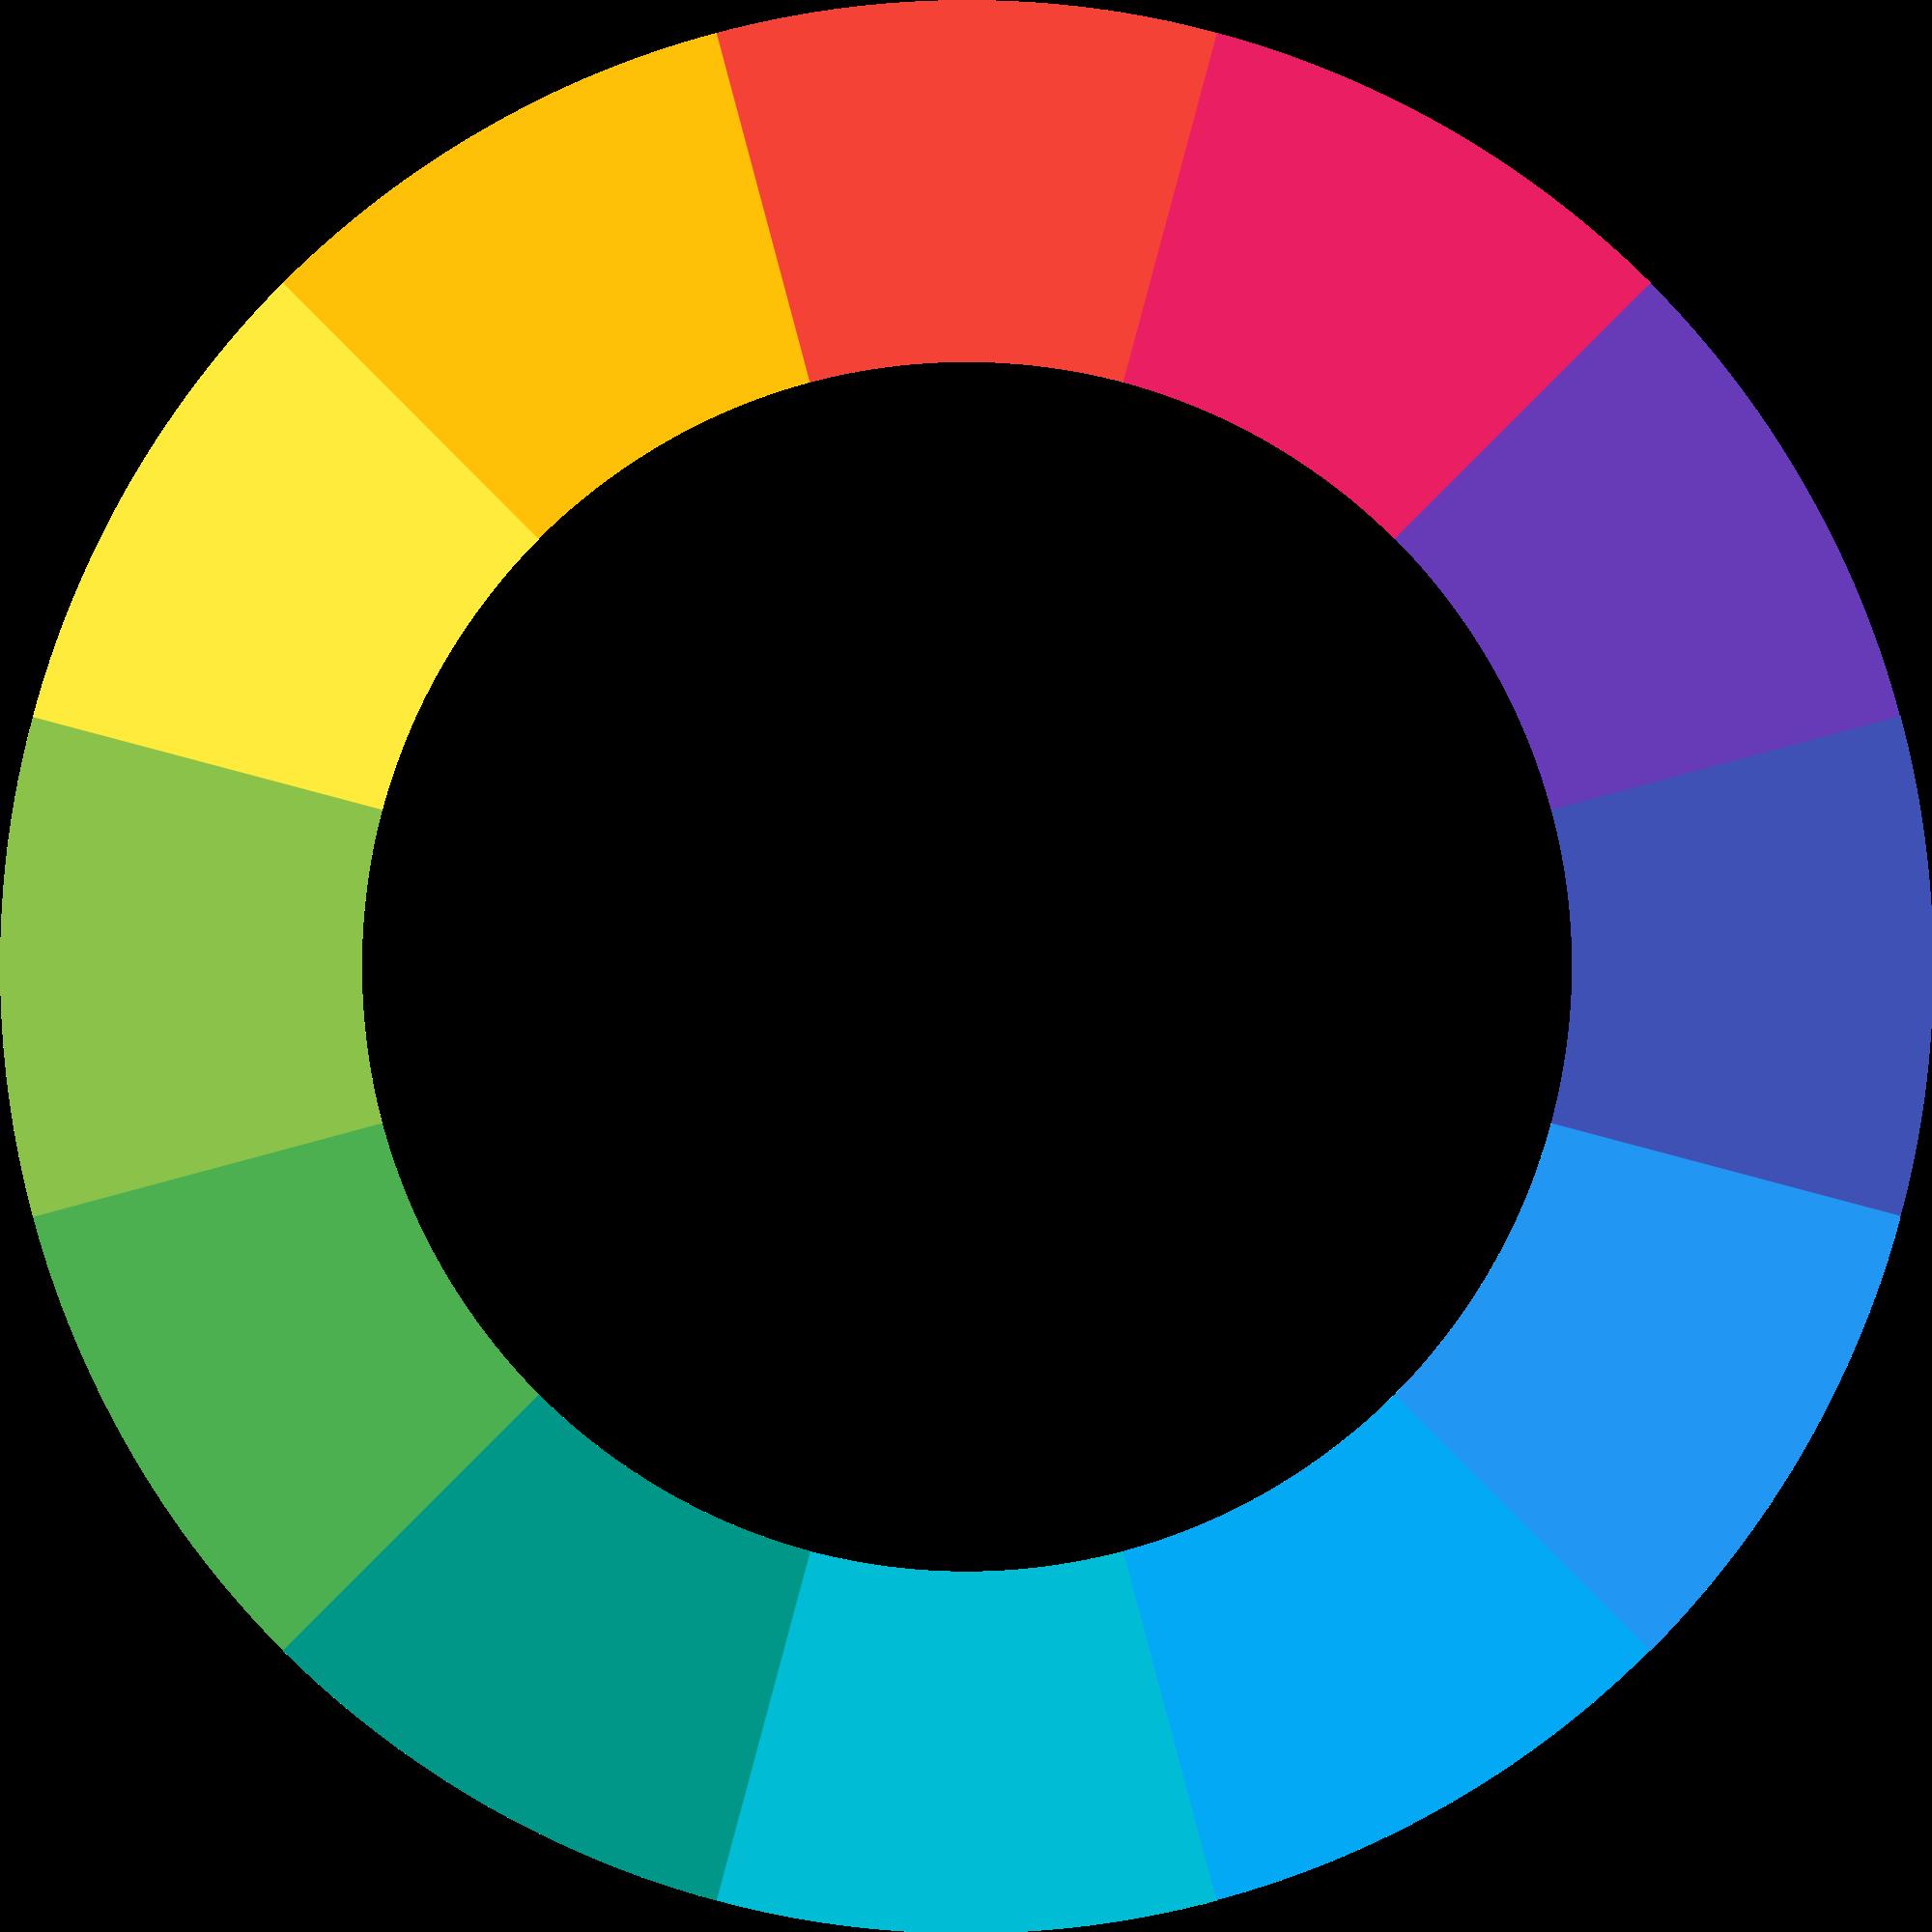 Color clipart color chart, Color color chart Transparent.